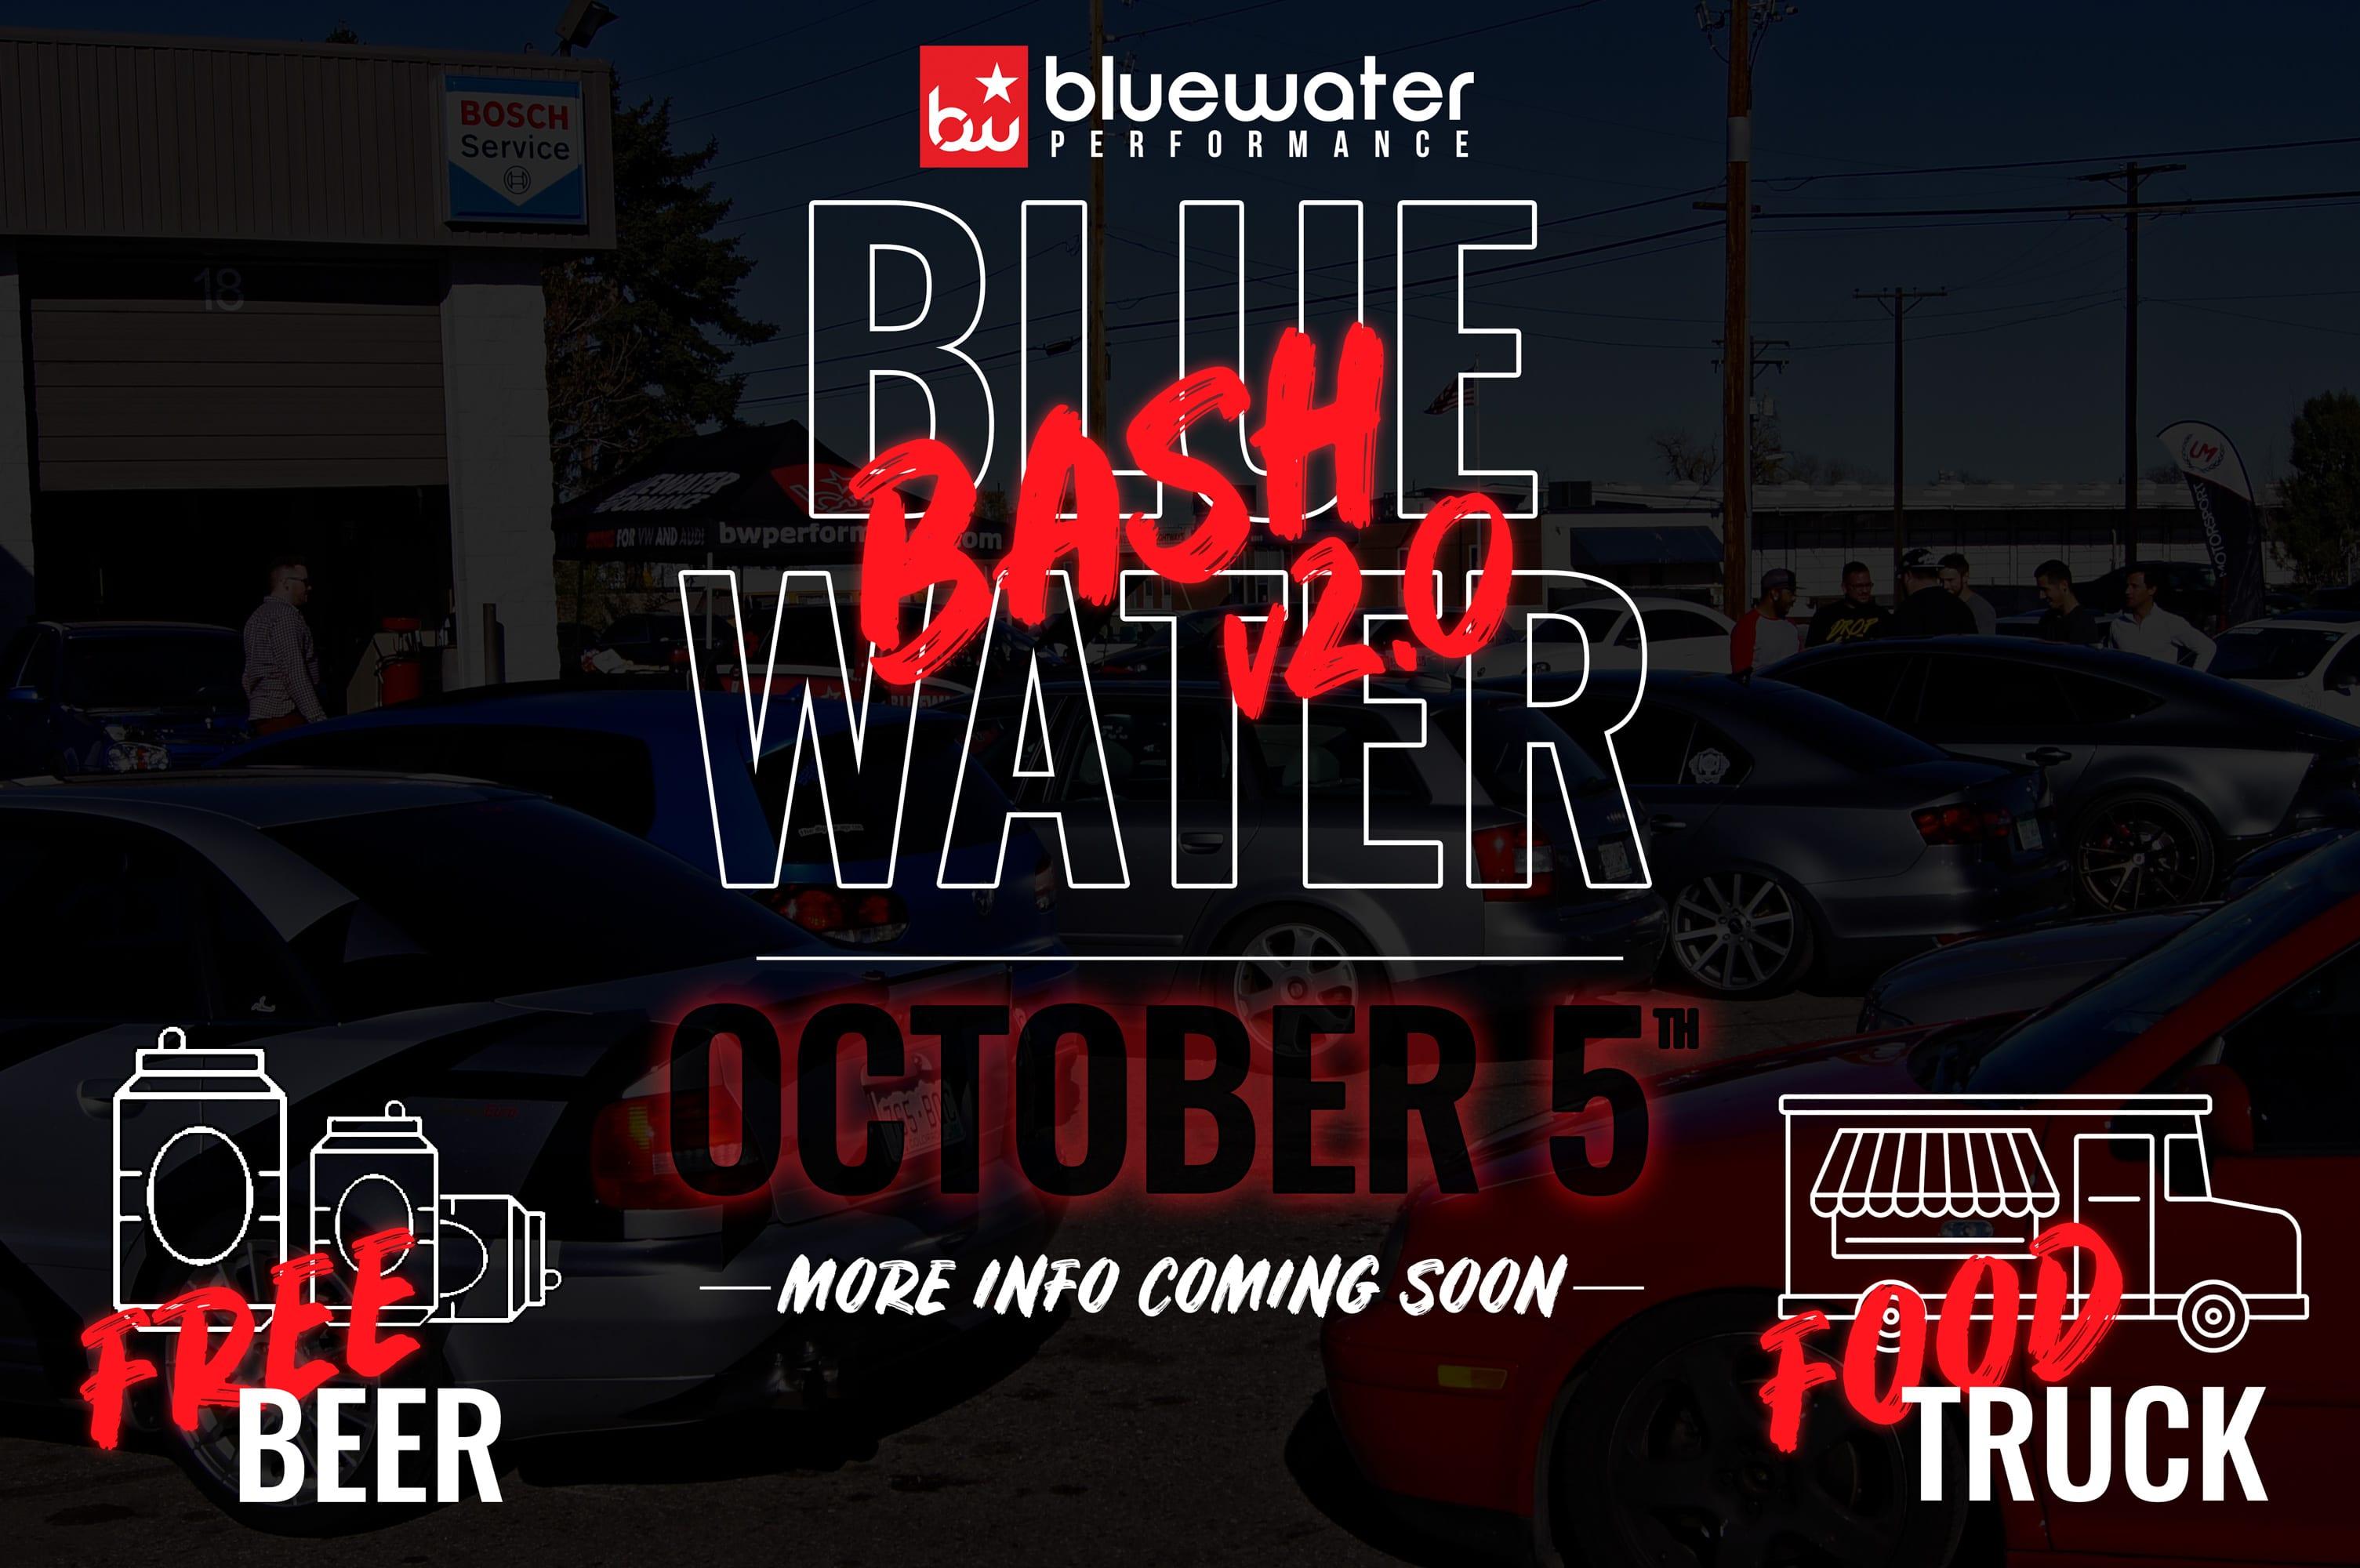 Bluewater Bash v2.0